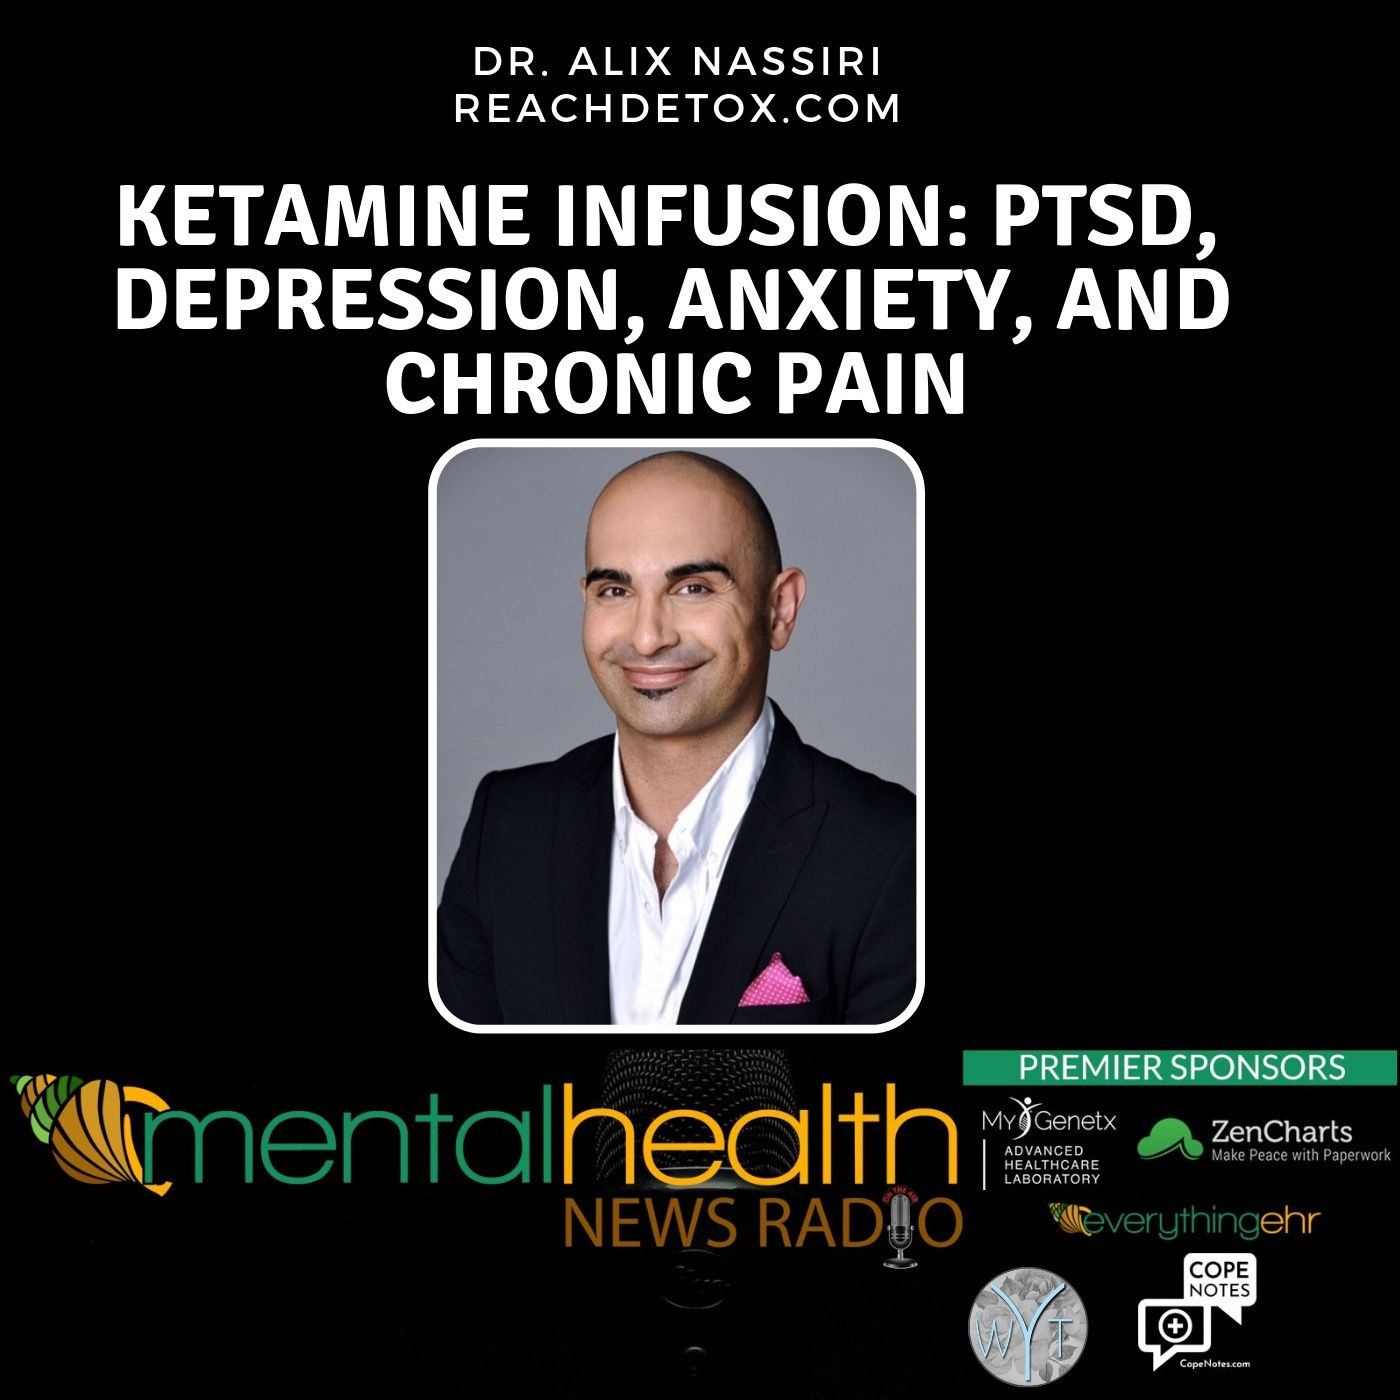 Mental Health News Radio - KETAMINE INFUSION: PTSD, DEPRESSION, ANXIETY, AND CHRONIC PAIN